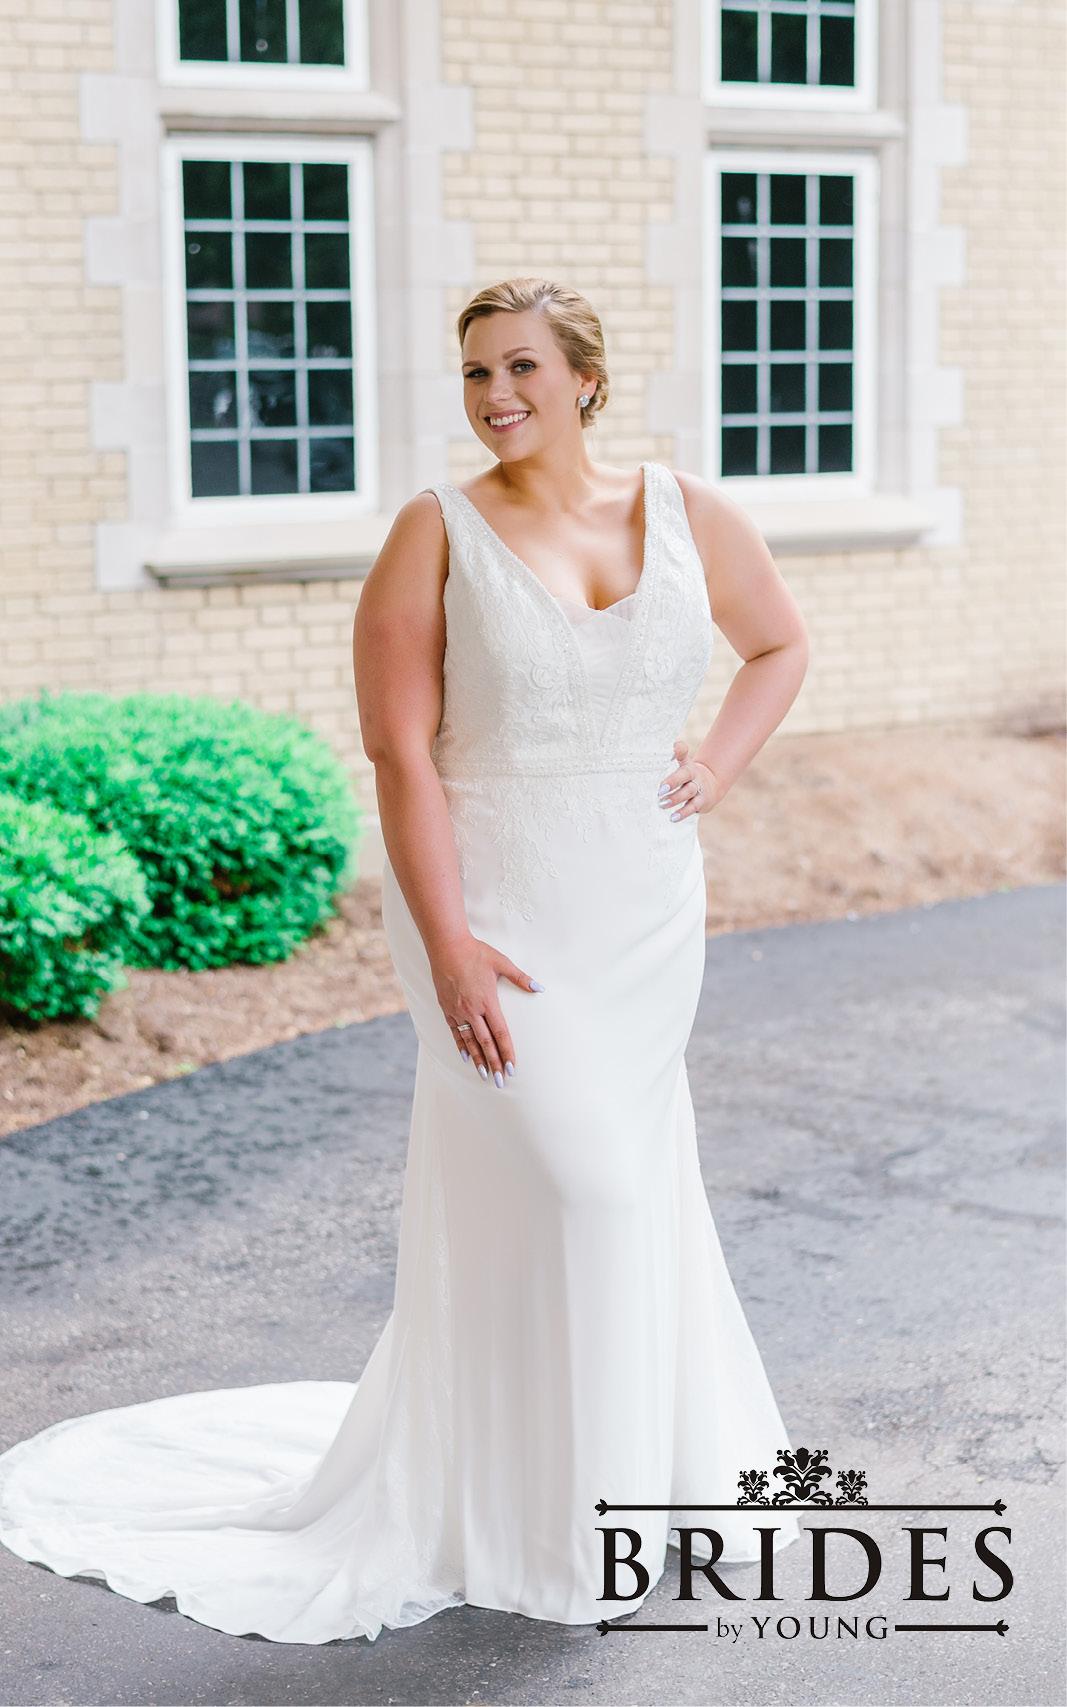 BridesbyYoung-2020Collection-PlusSizeBridalBoutique-CurvyWeddingDressInspiration-154.jpg